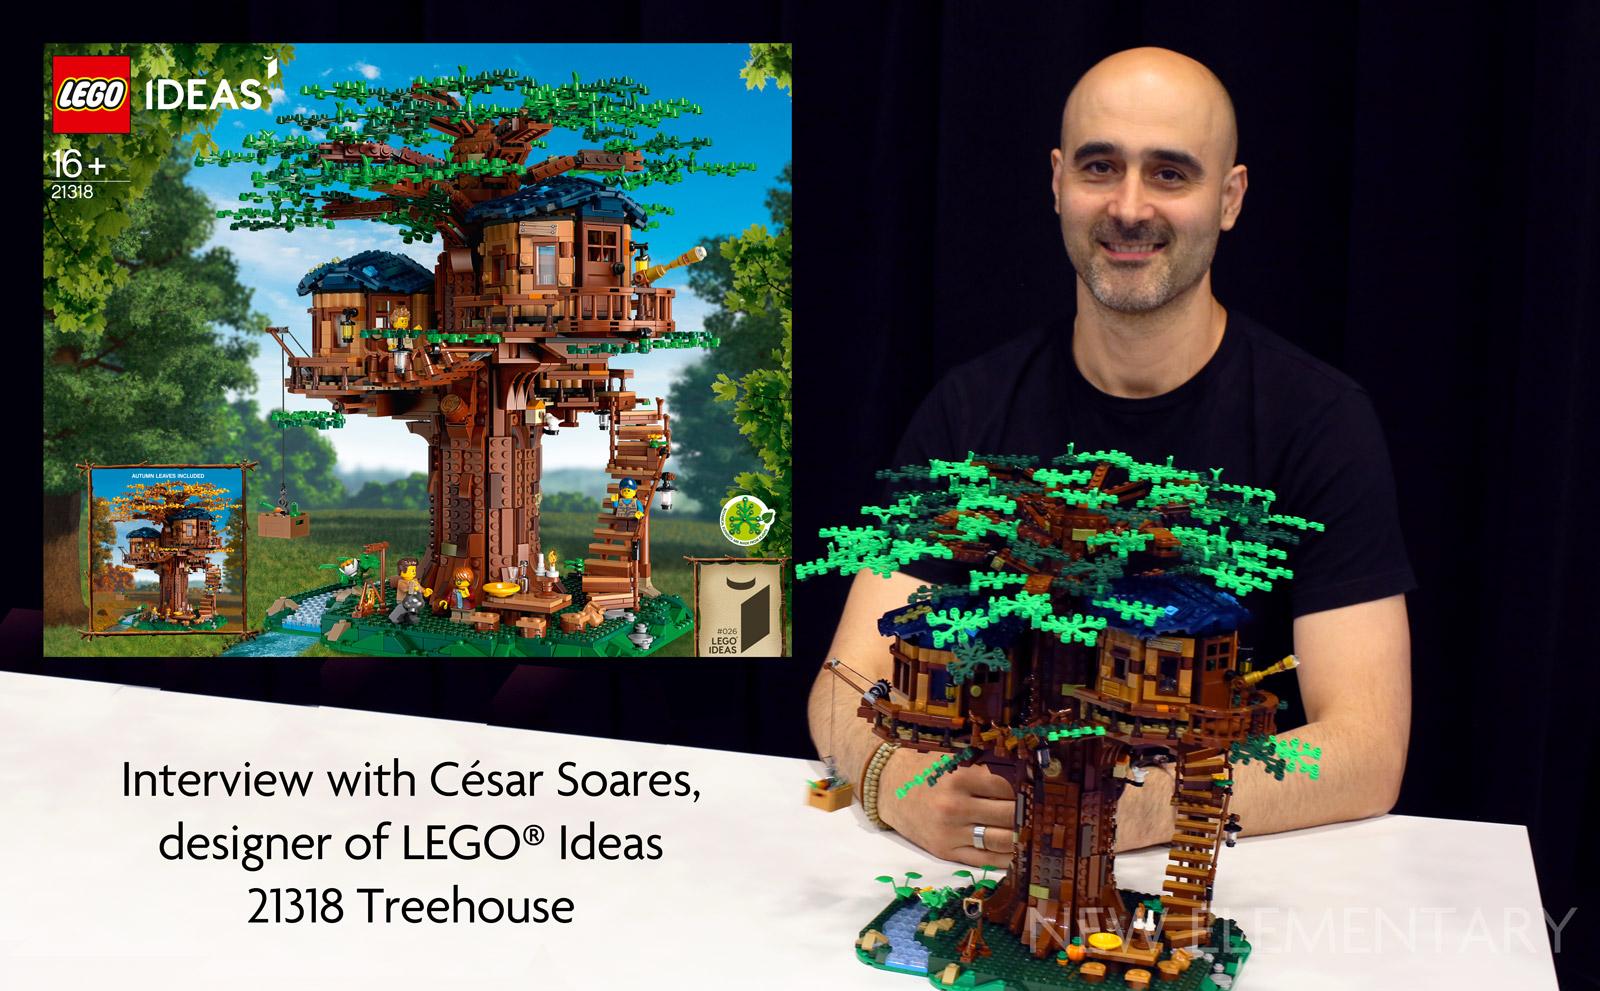 cesar-soares-interview-lego-ideas-treehouse.jpg